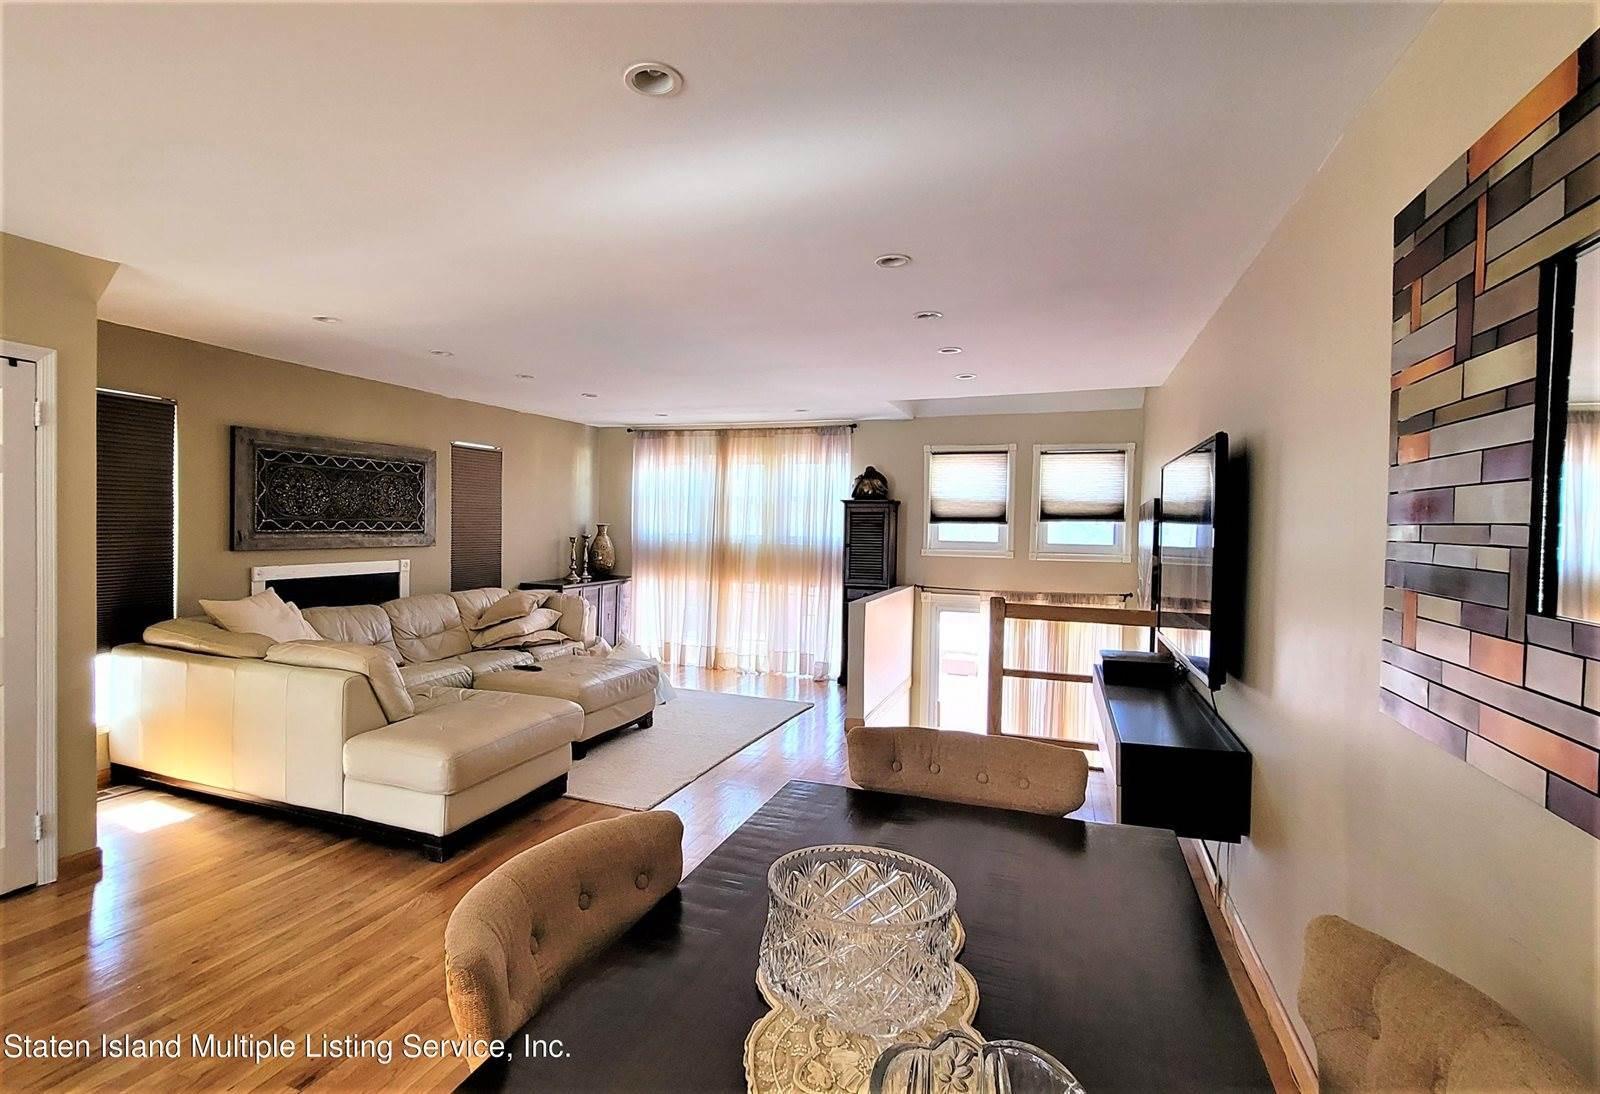 36 Villa Nova Street, Staten Island, NY 10314